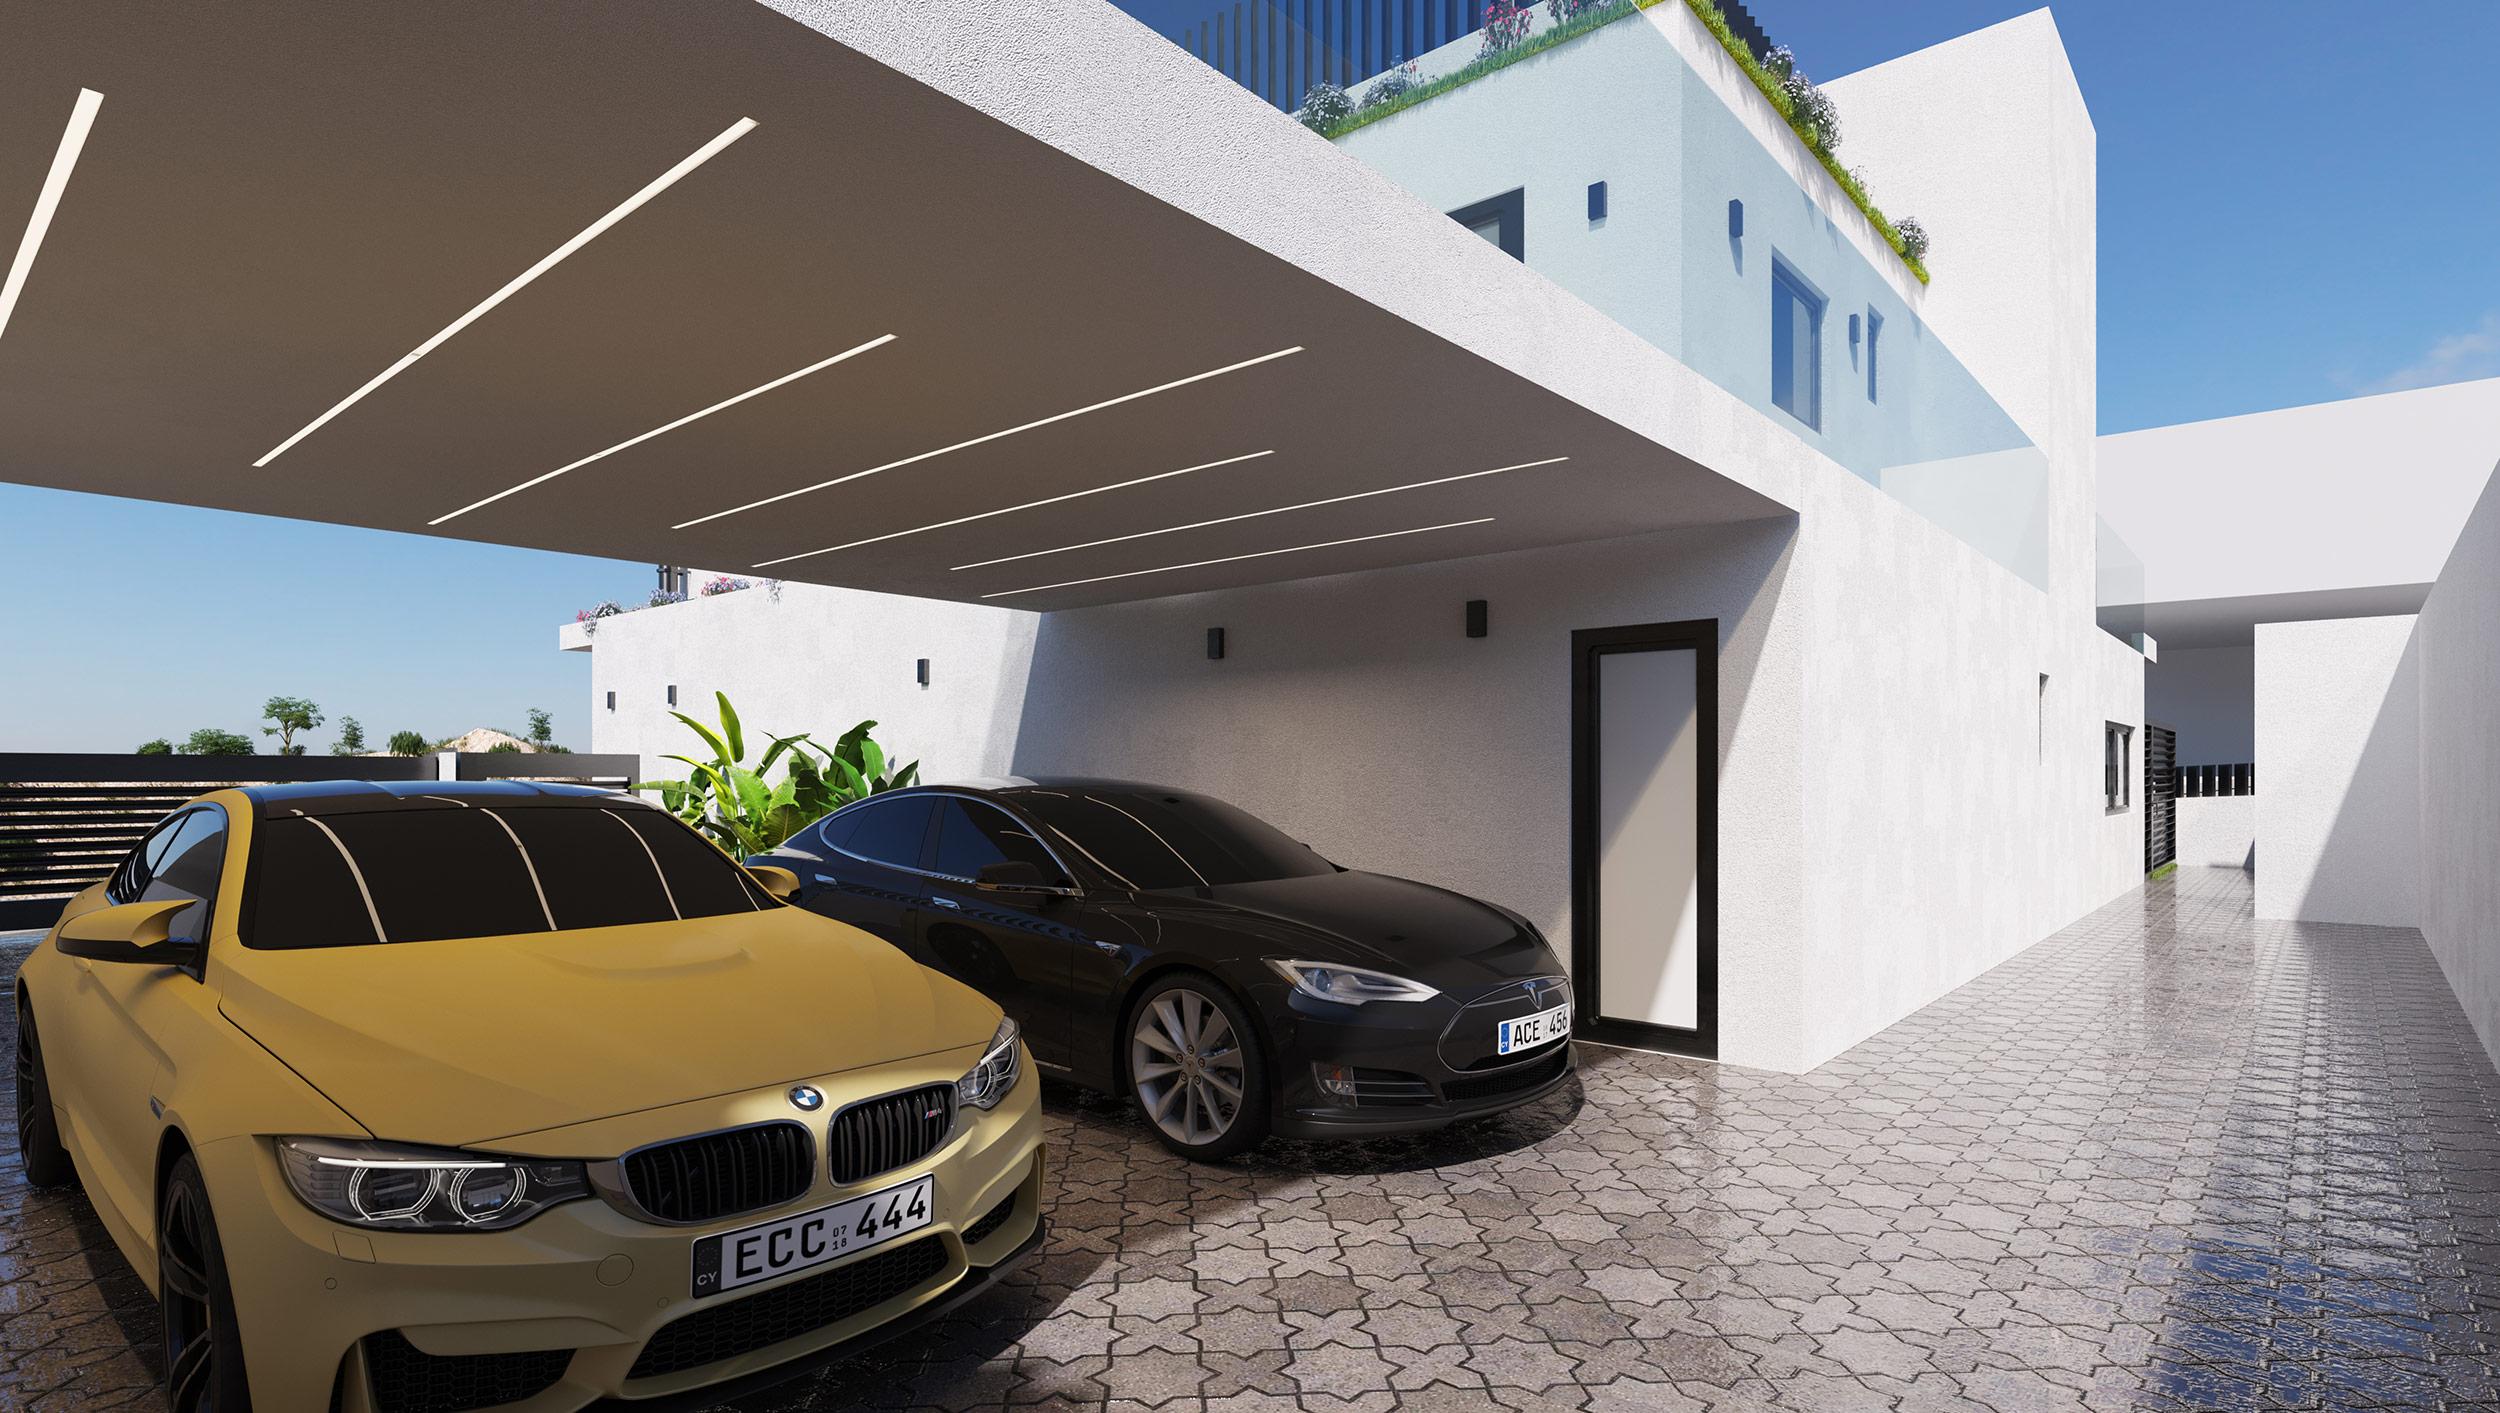 https://www.atelierzoz.com/wp-content/uploads/2020/12/atelierzoz-meadowview-villa-7.jpg